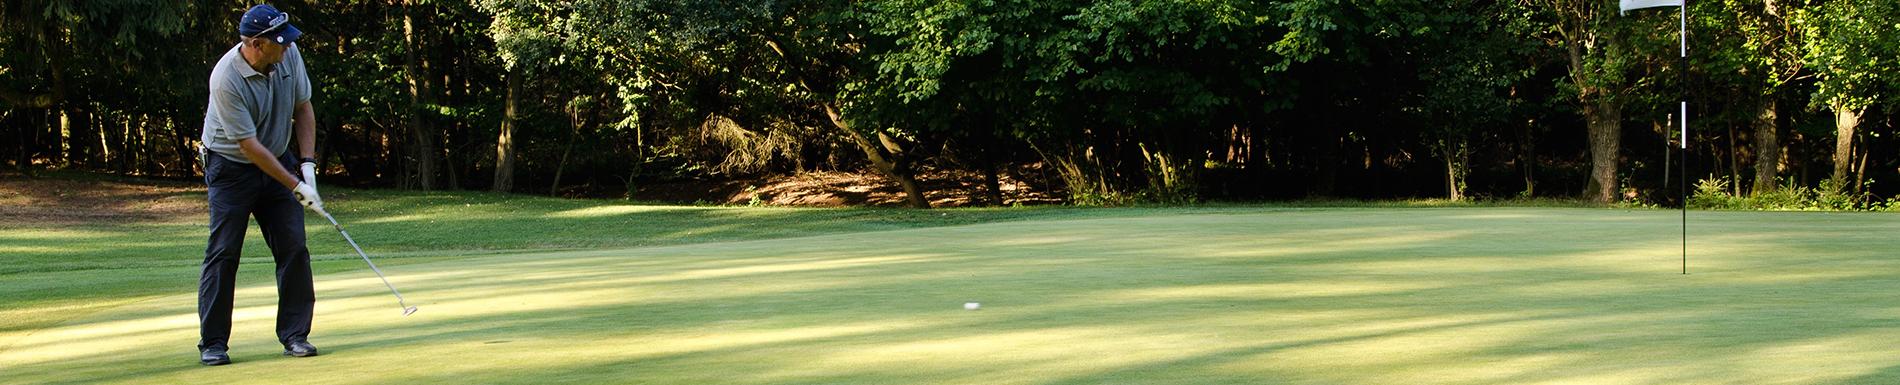 20130906_golfclub_worpswede-5-header